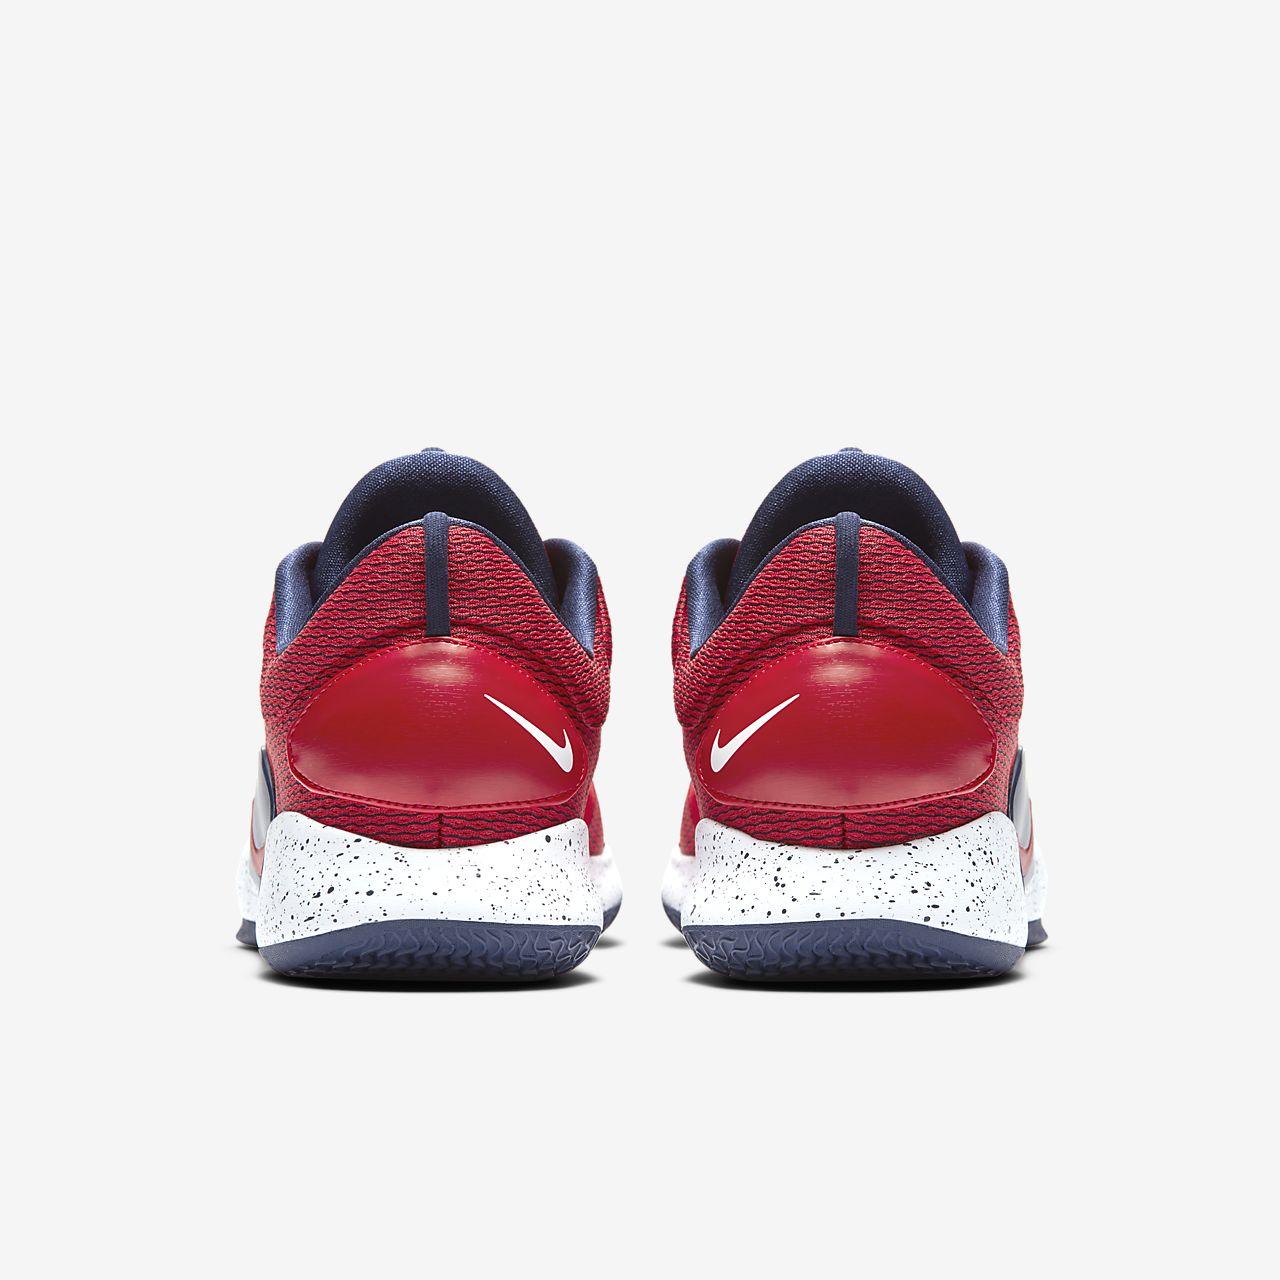 newest b6dc4 2393a ... Nike Hyperdunk X Low Herren-Basketballschuh